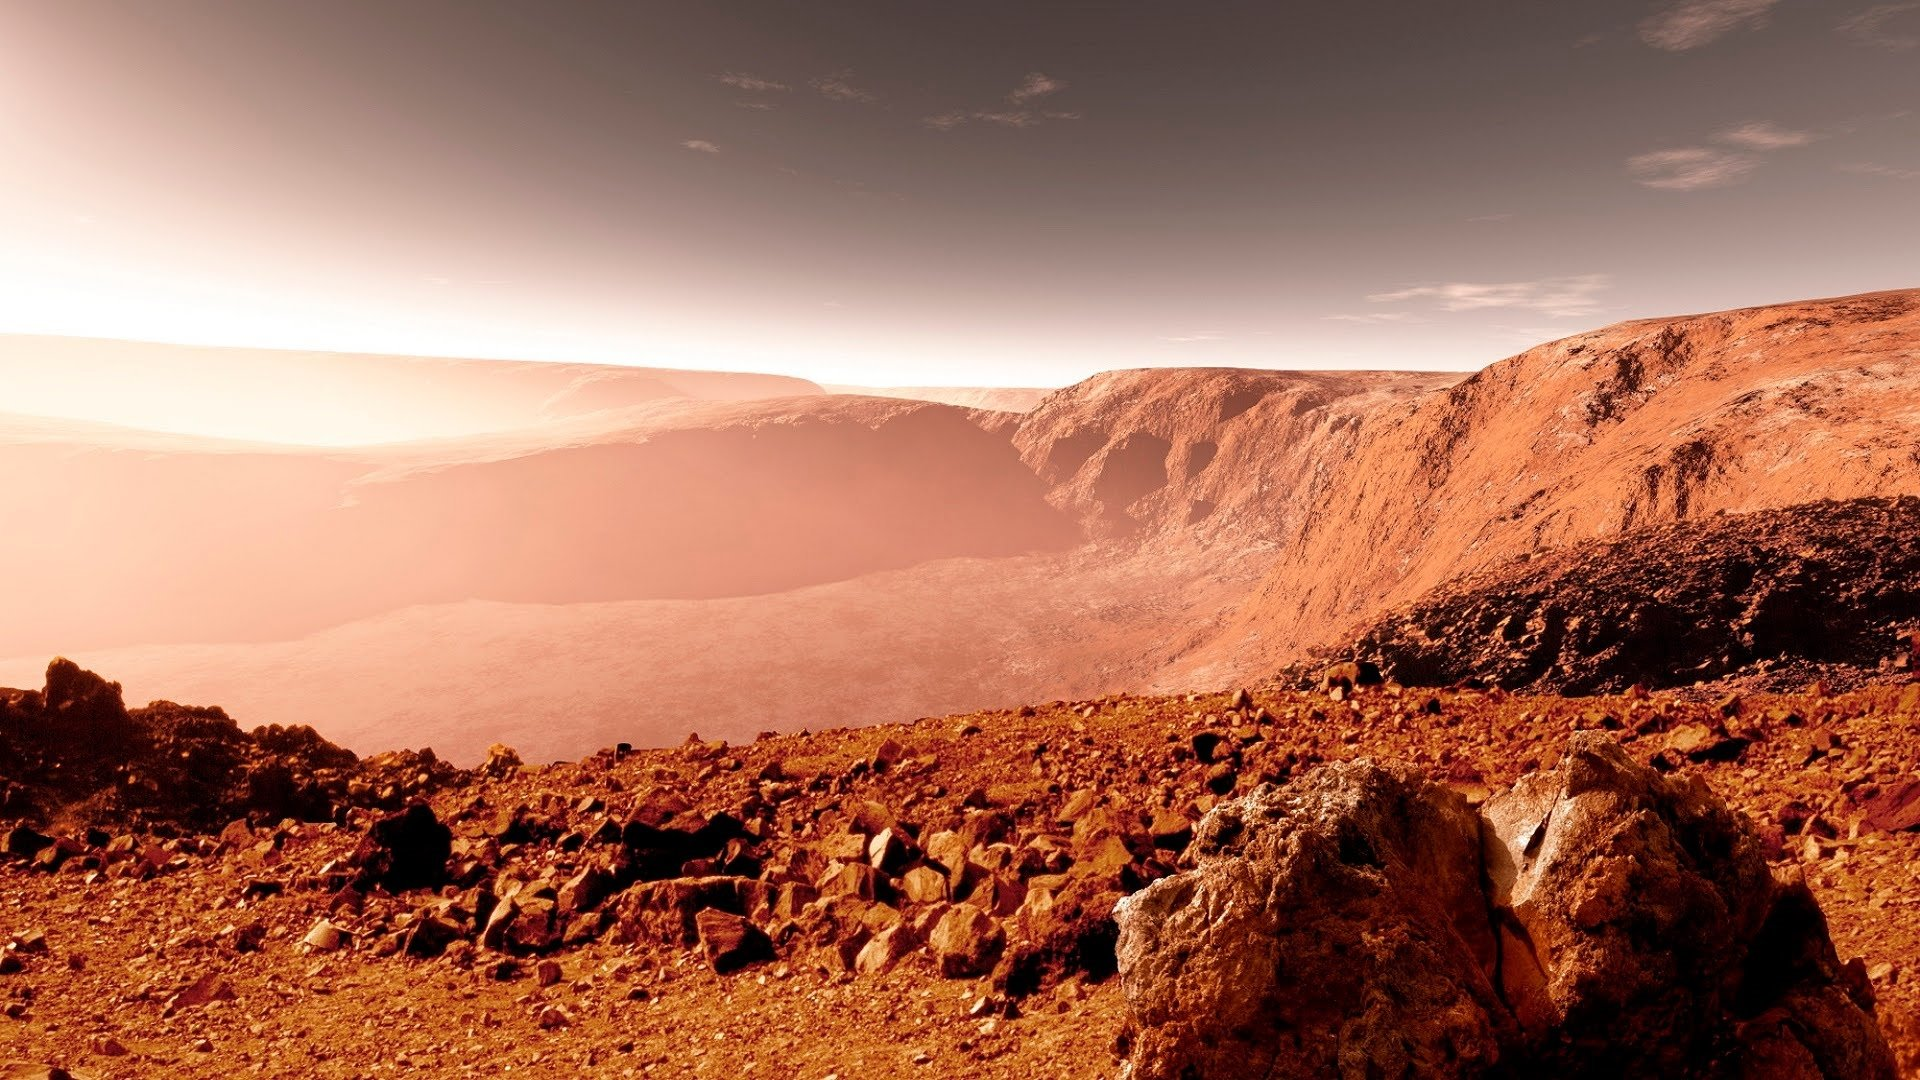 Mars Wallpaper Download Full